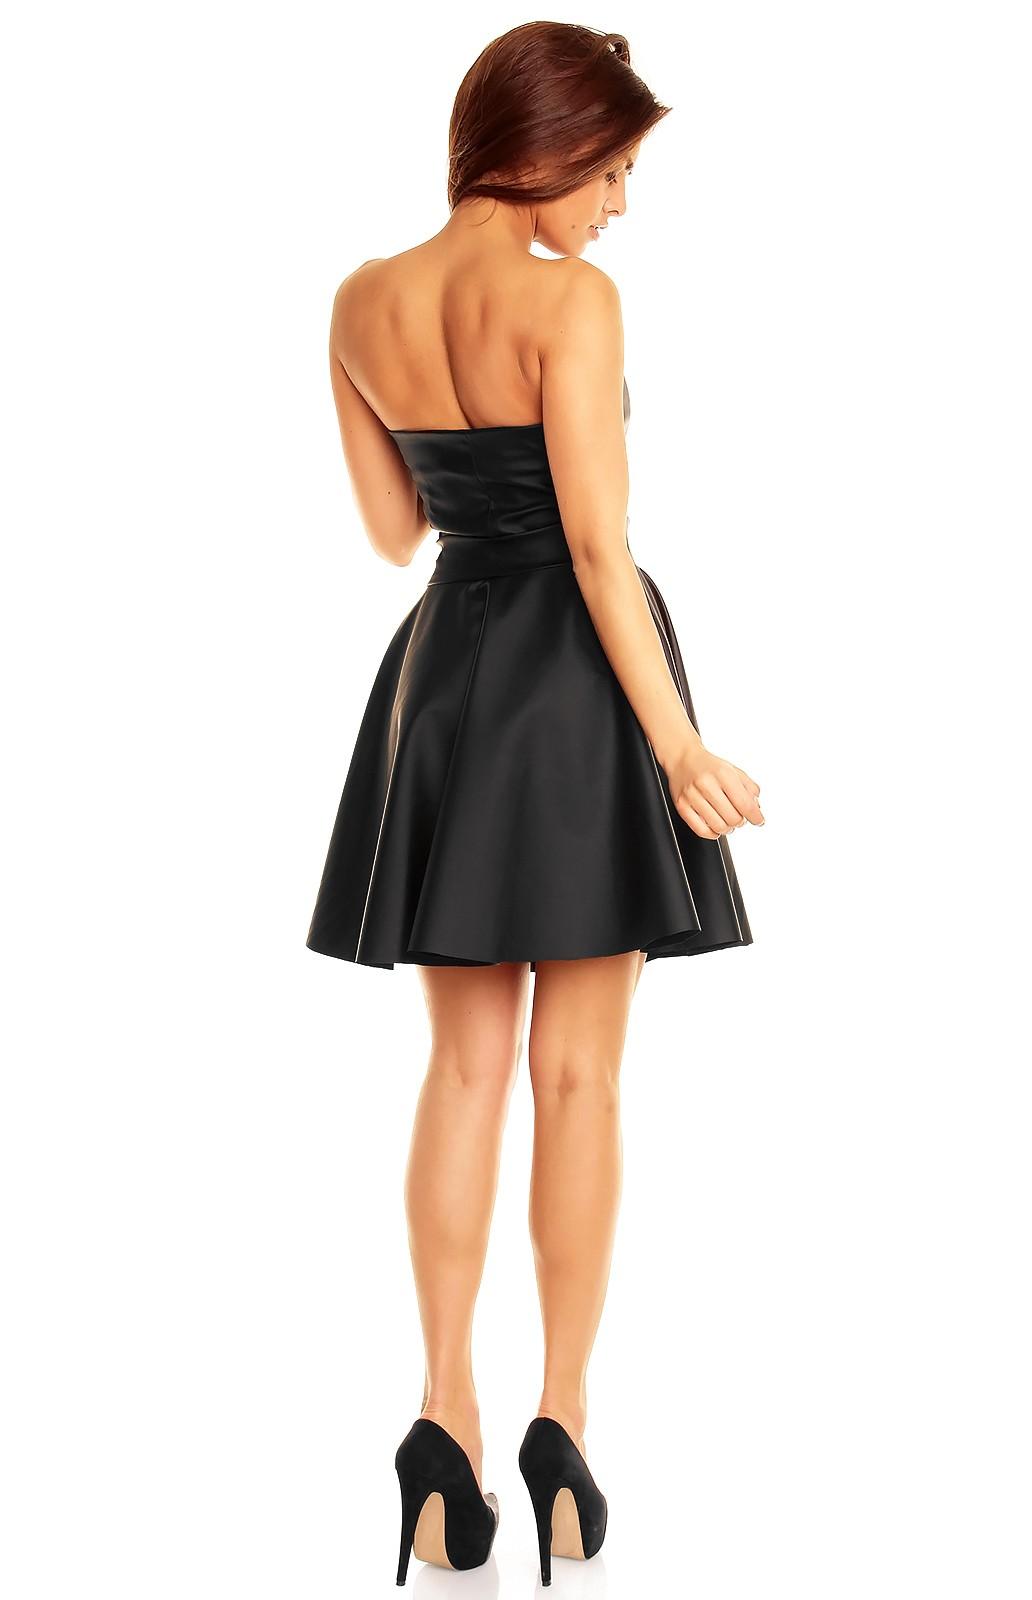 robe la mode robe bustier noire simili cuir. Black Bedroom Furniture Sets. Home Design Ideas